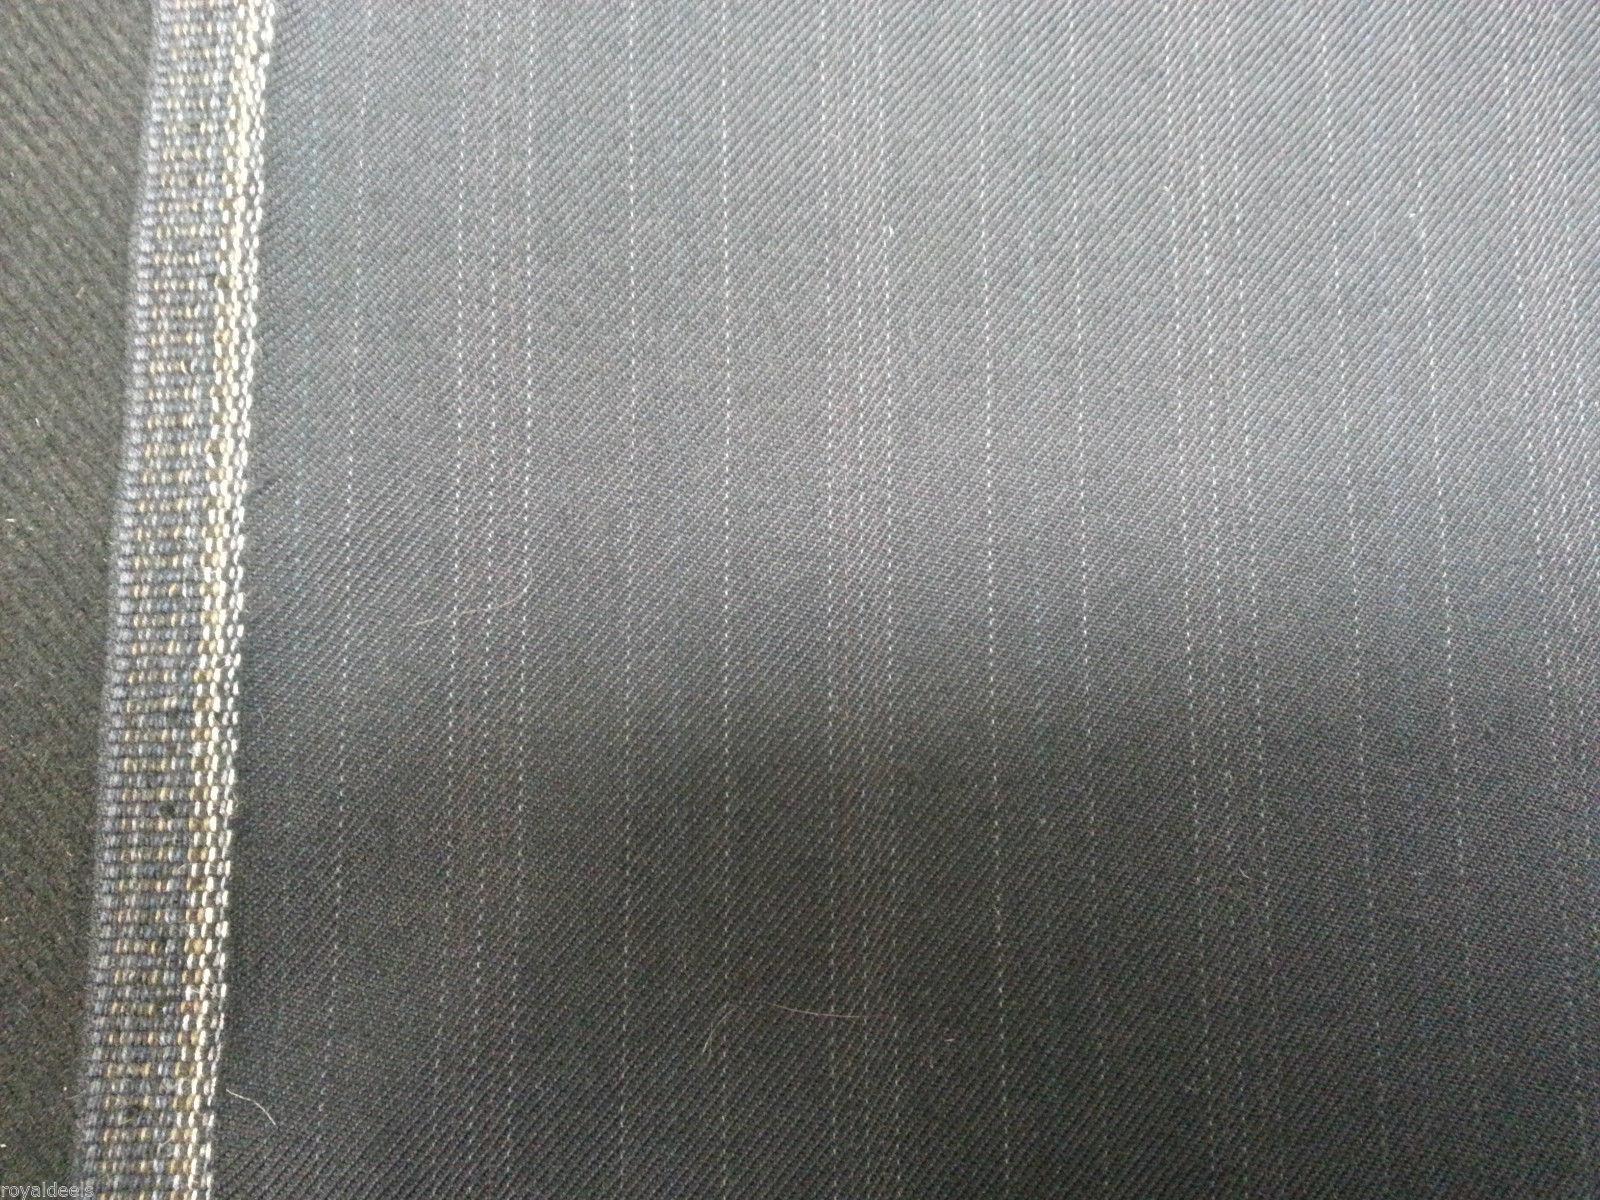 5 YRD NAVY BLUE ENGLISH WOOL Pin Stripe Suit Skirt Jacket Fashion Sewing Fabric